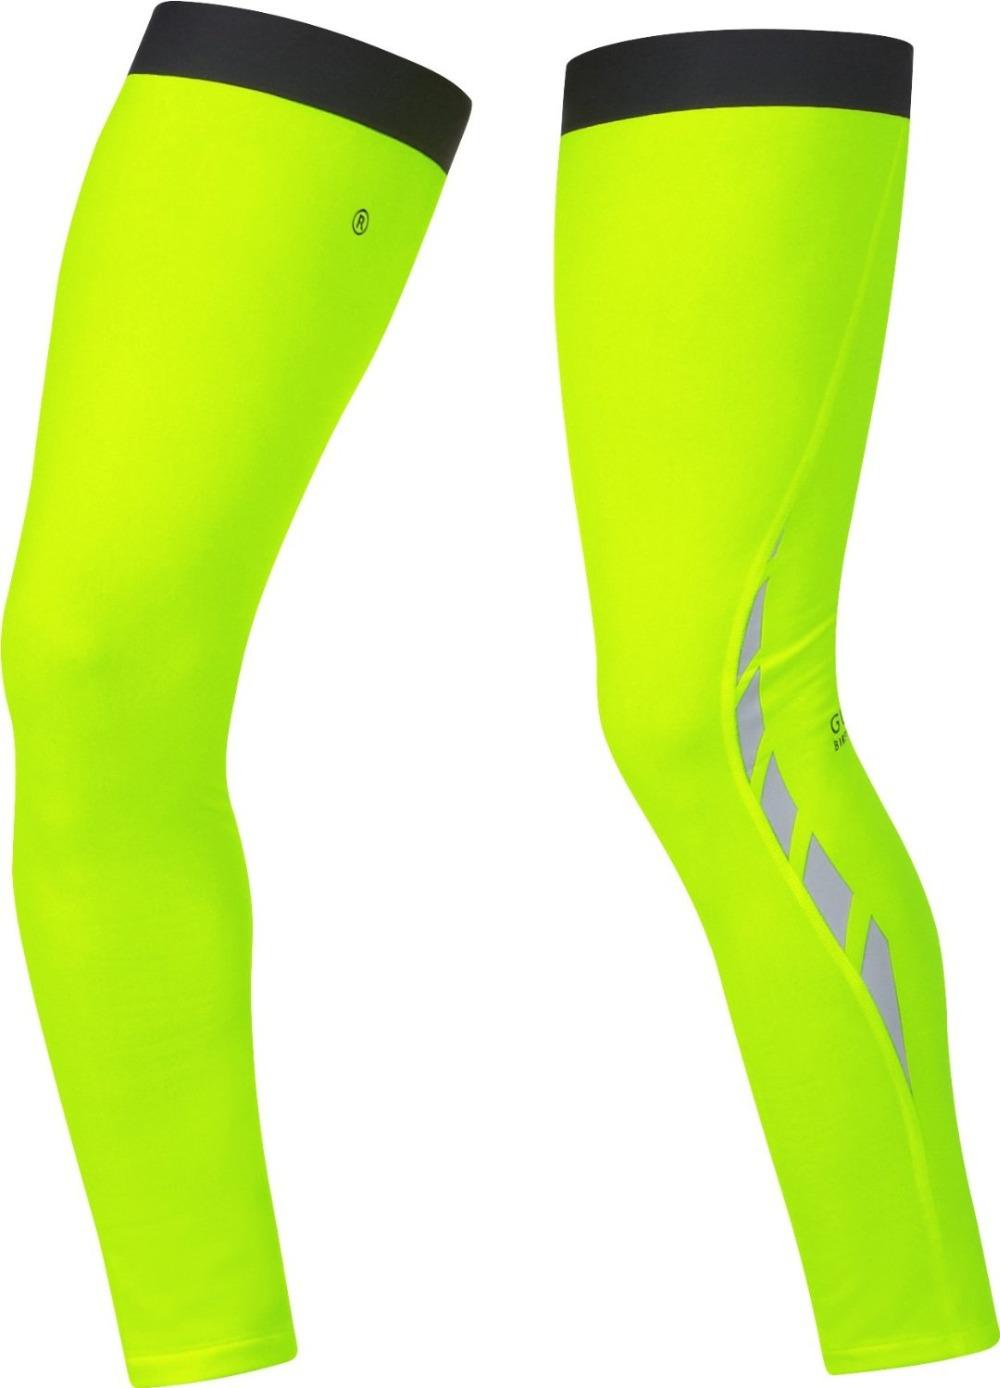 Free shipping Gores Bike Wear Men's Cycling Leg Warmer Cycling Leg Warmer $19.99 for spring $20.99 for winter size:S M L yy010(China (Mainland))